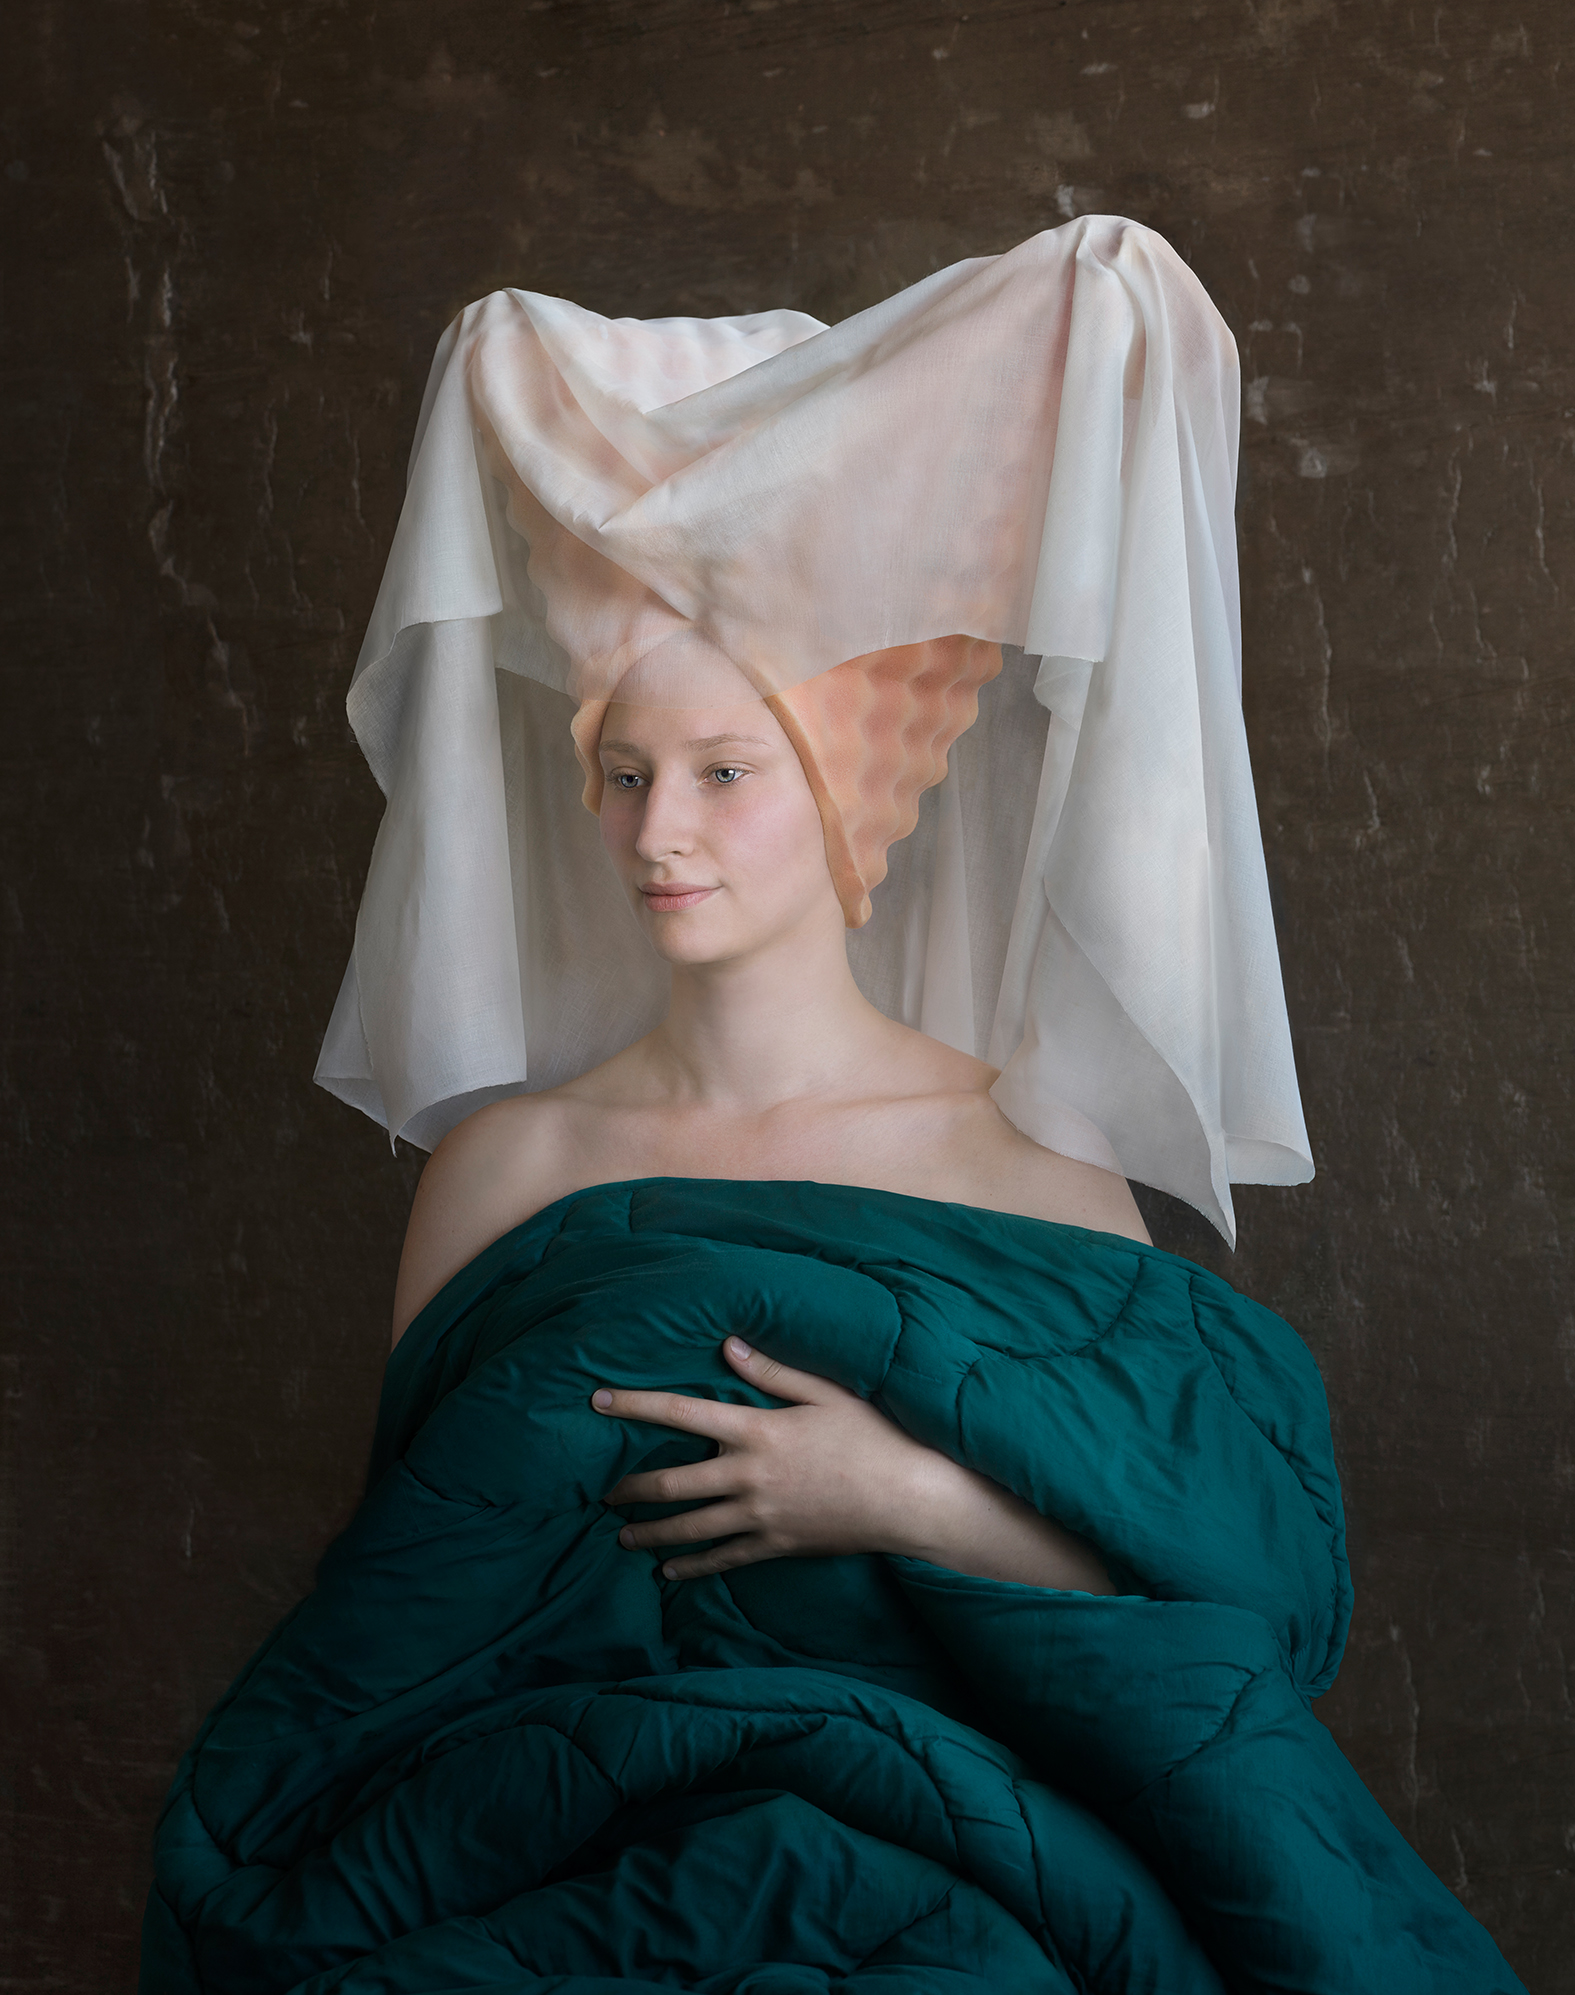 Suzanne Jongmans - Moving through contrast